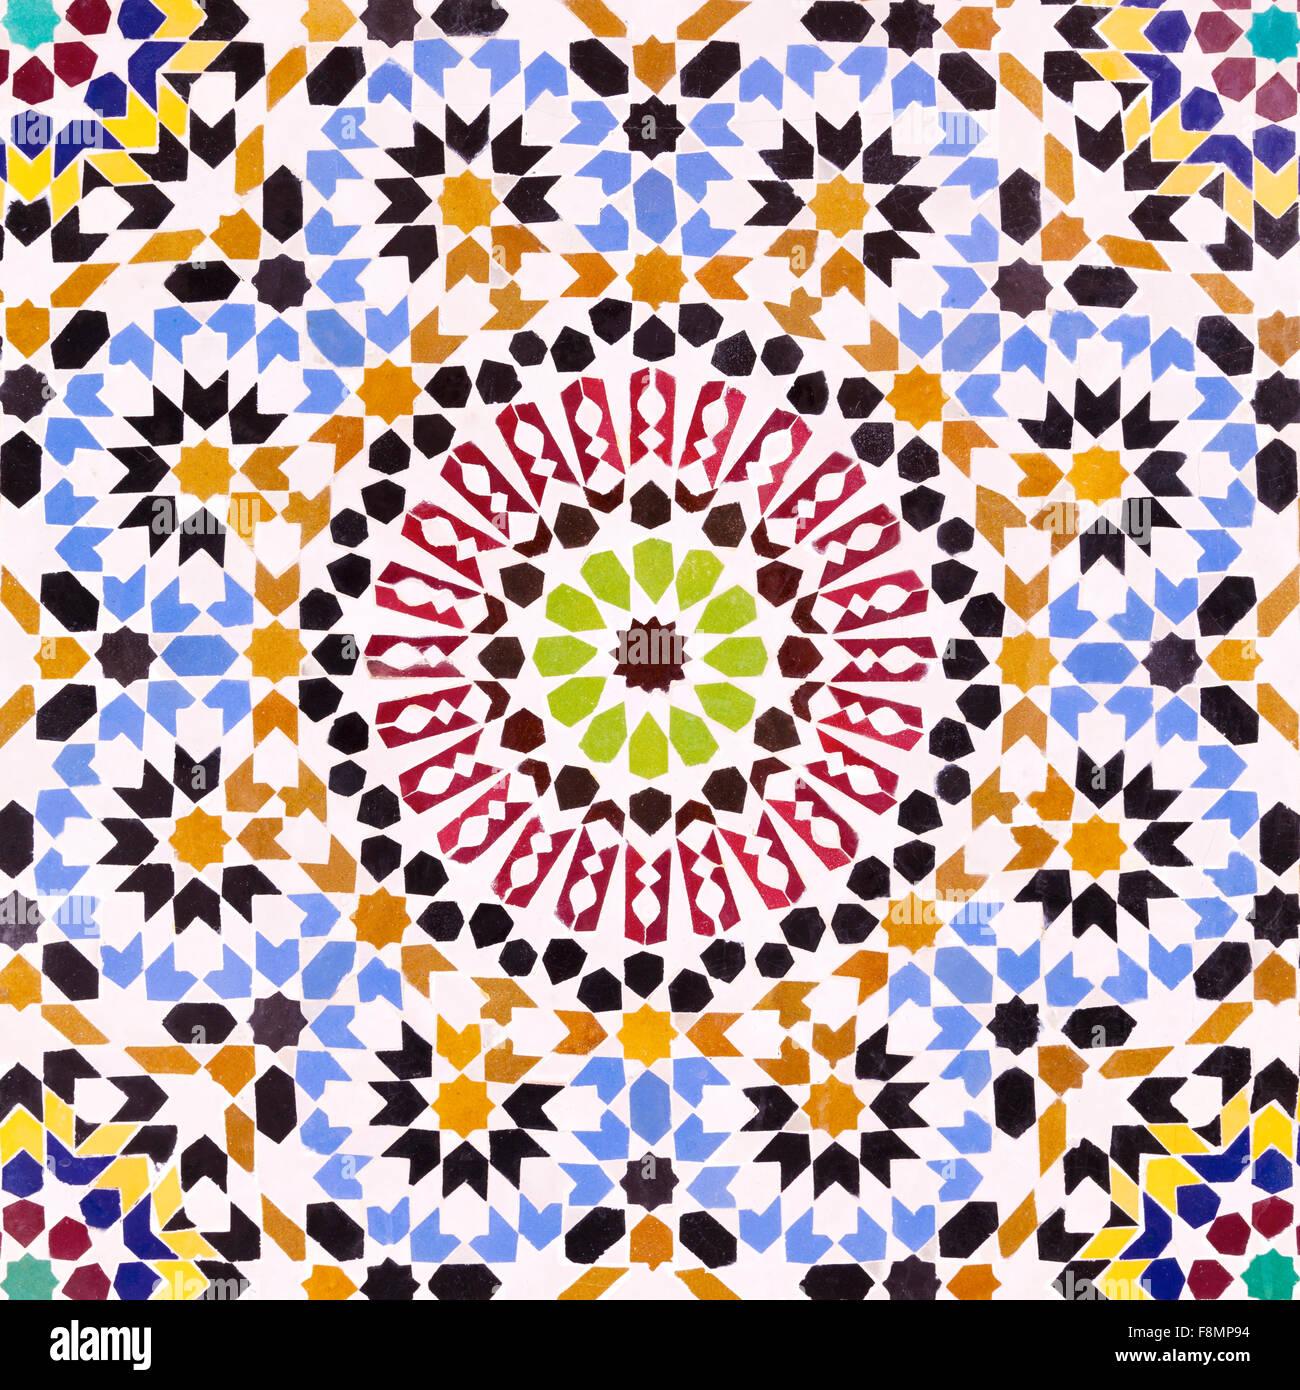 Zillij moroccan ceramic mosaic tile decoration marrakech morocco zillij moroccan ceramic mosaic tile decoration marrakech morocco dailygadgetfo Gallery